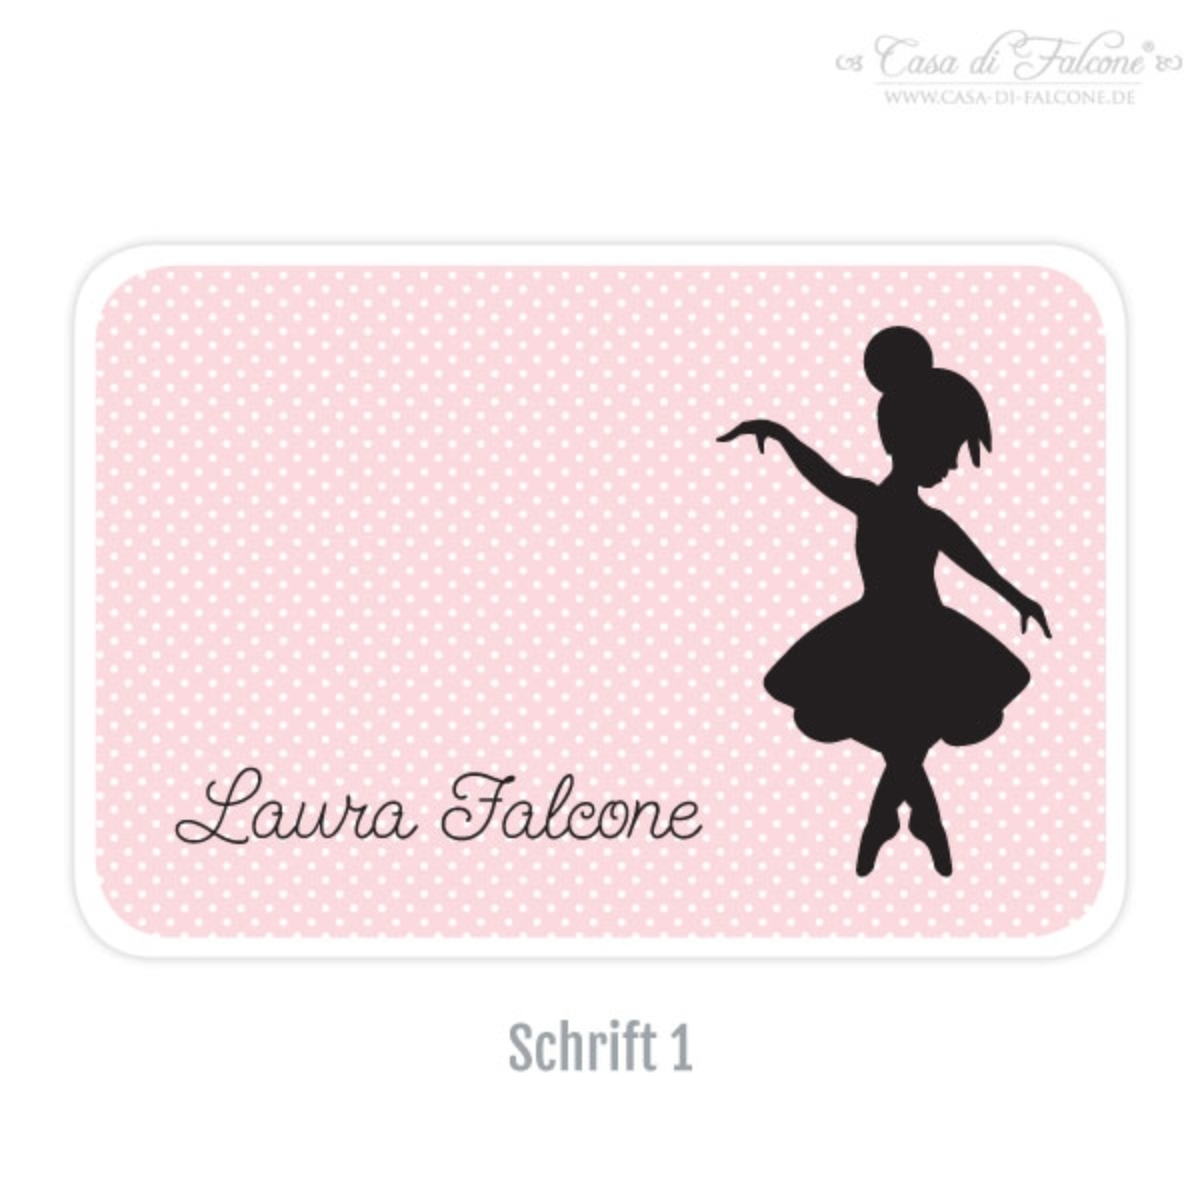 personalisierte brotdose i butterbrotdose ballerina casa di falcone. Black Bedroom Furniture Sets. Home Design Ideas